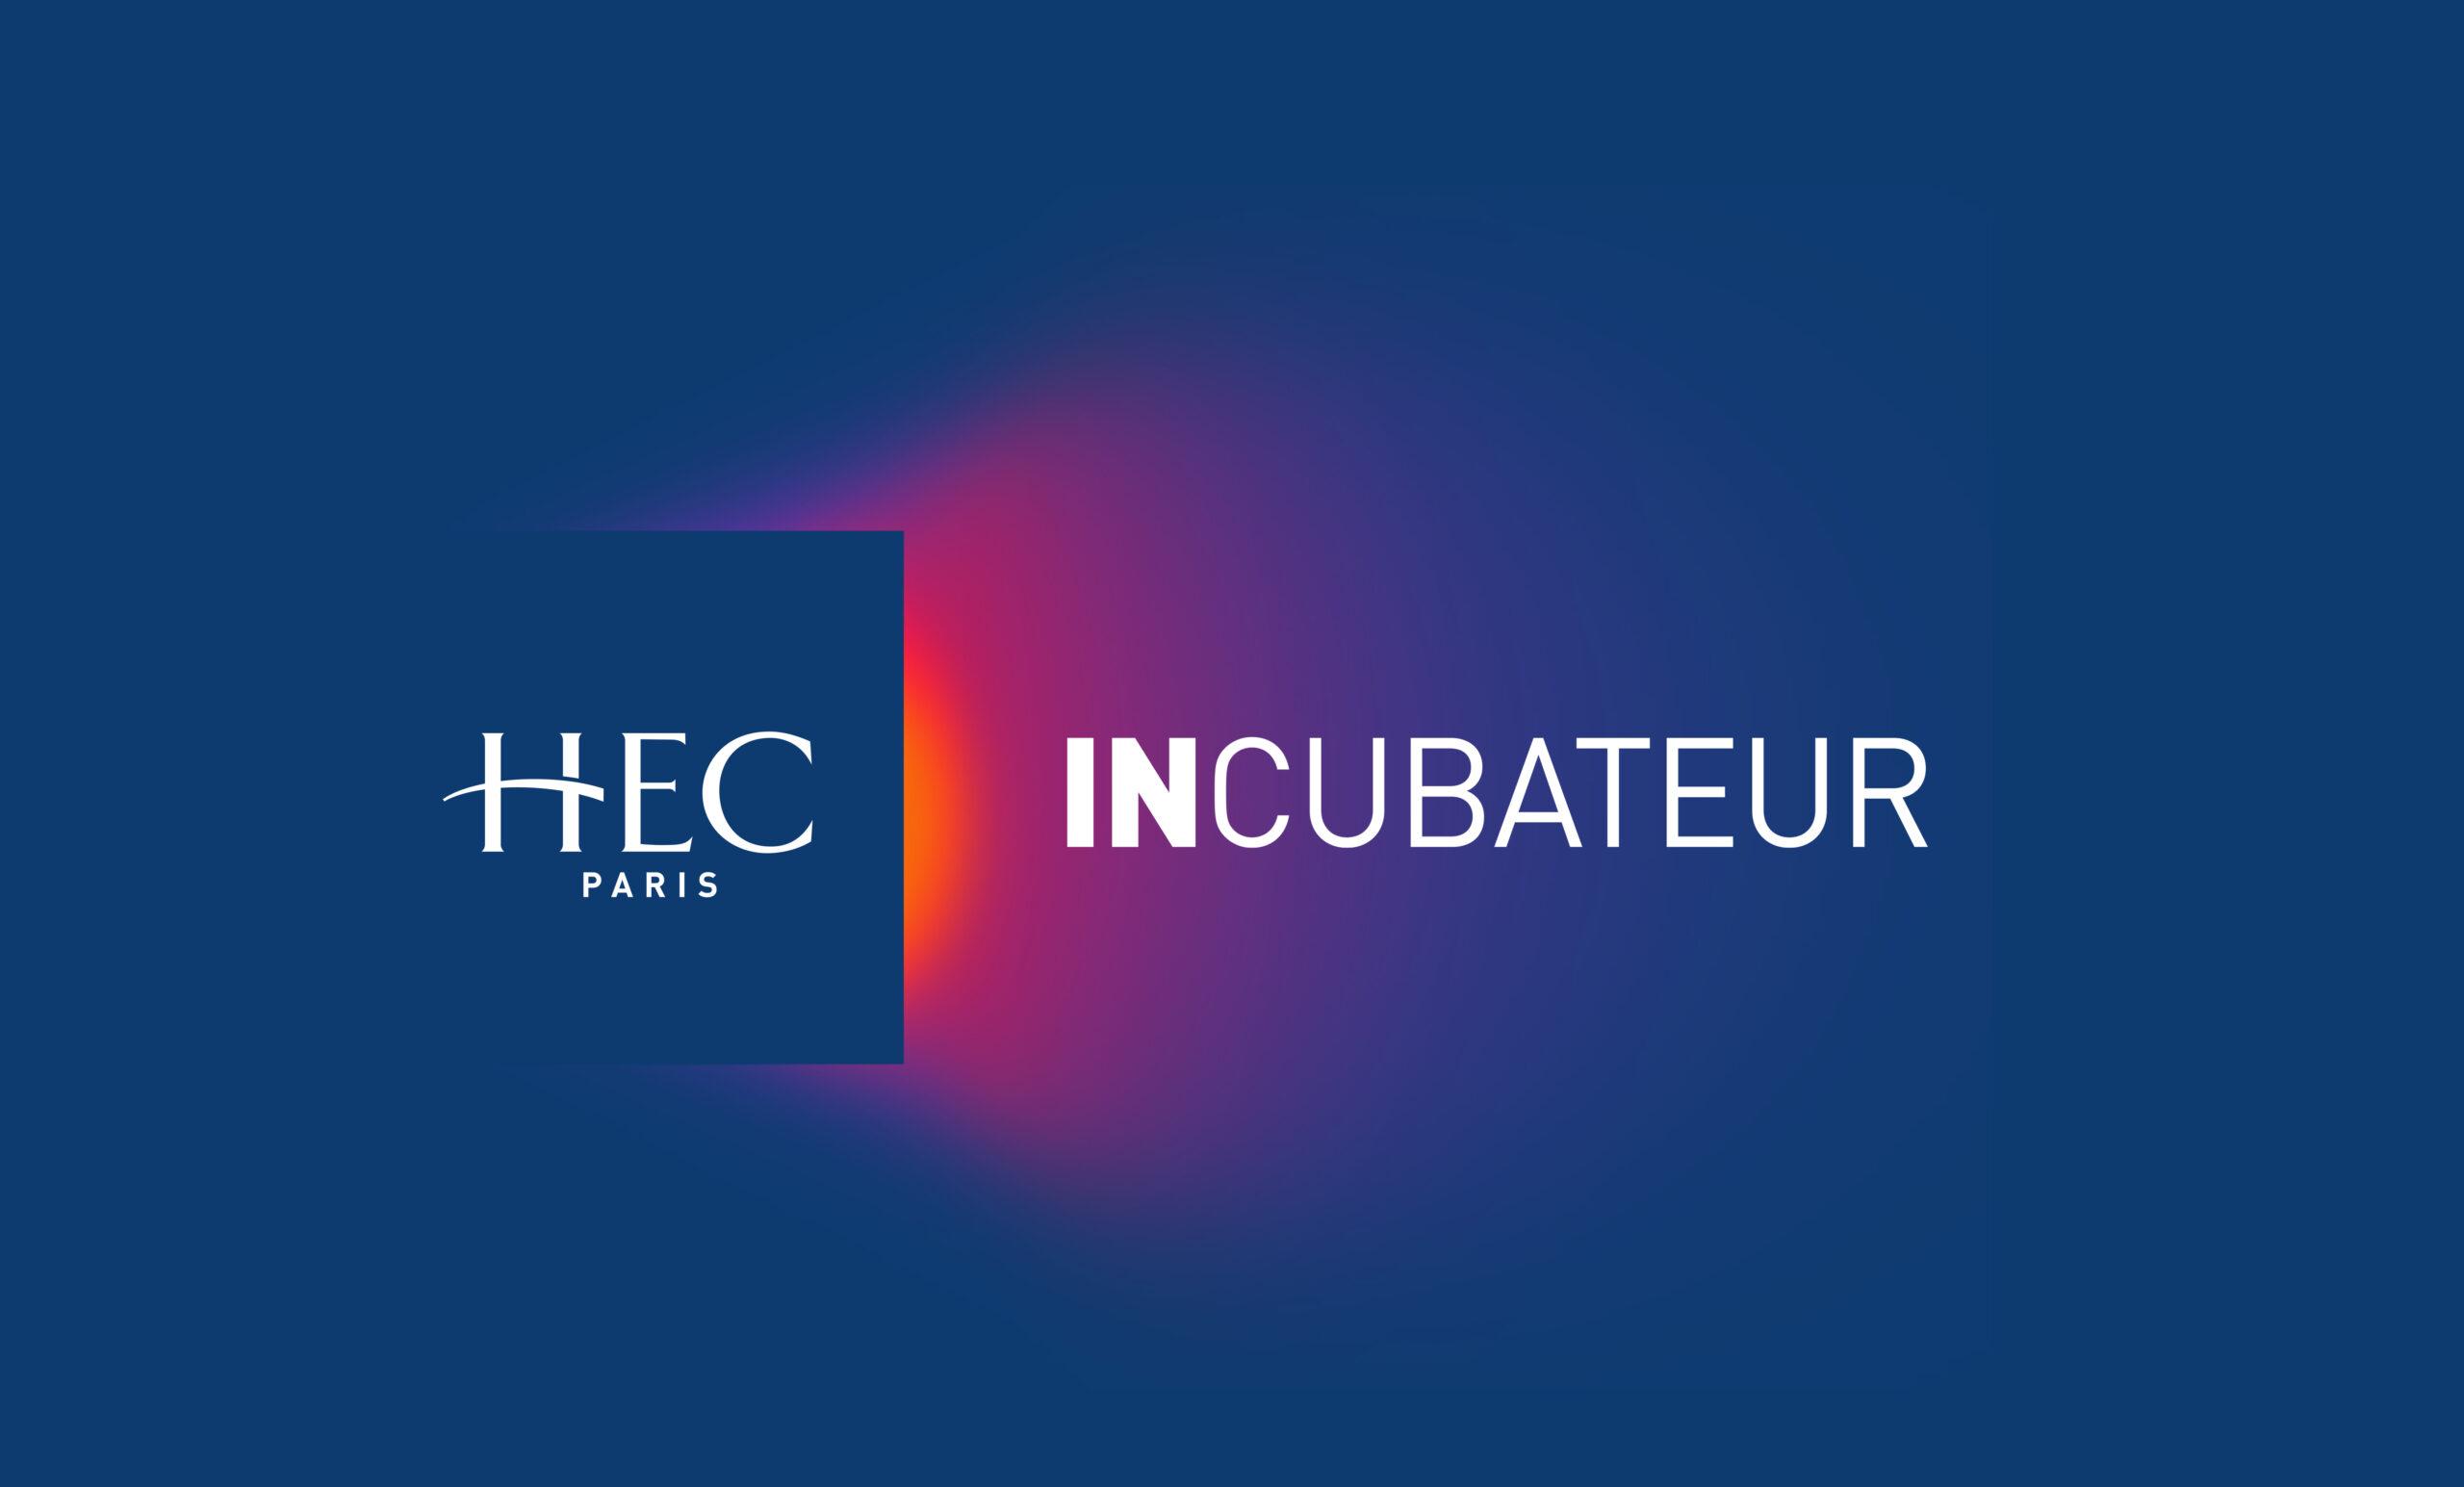 HEC Incubator - https://www.hec.edu/fr/faculty-research/centers/idea-center/act/incubateur-hec-paris